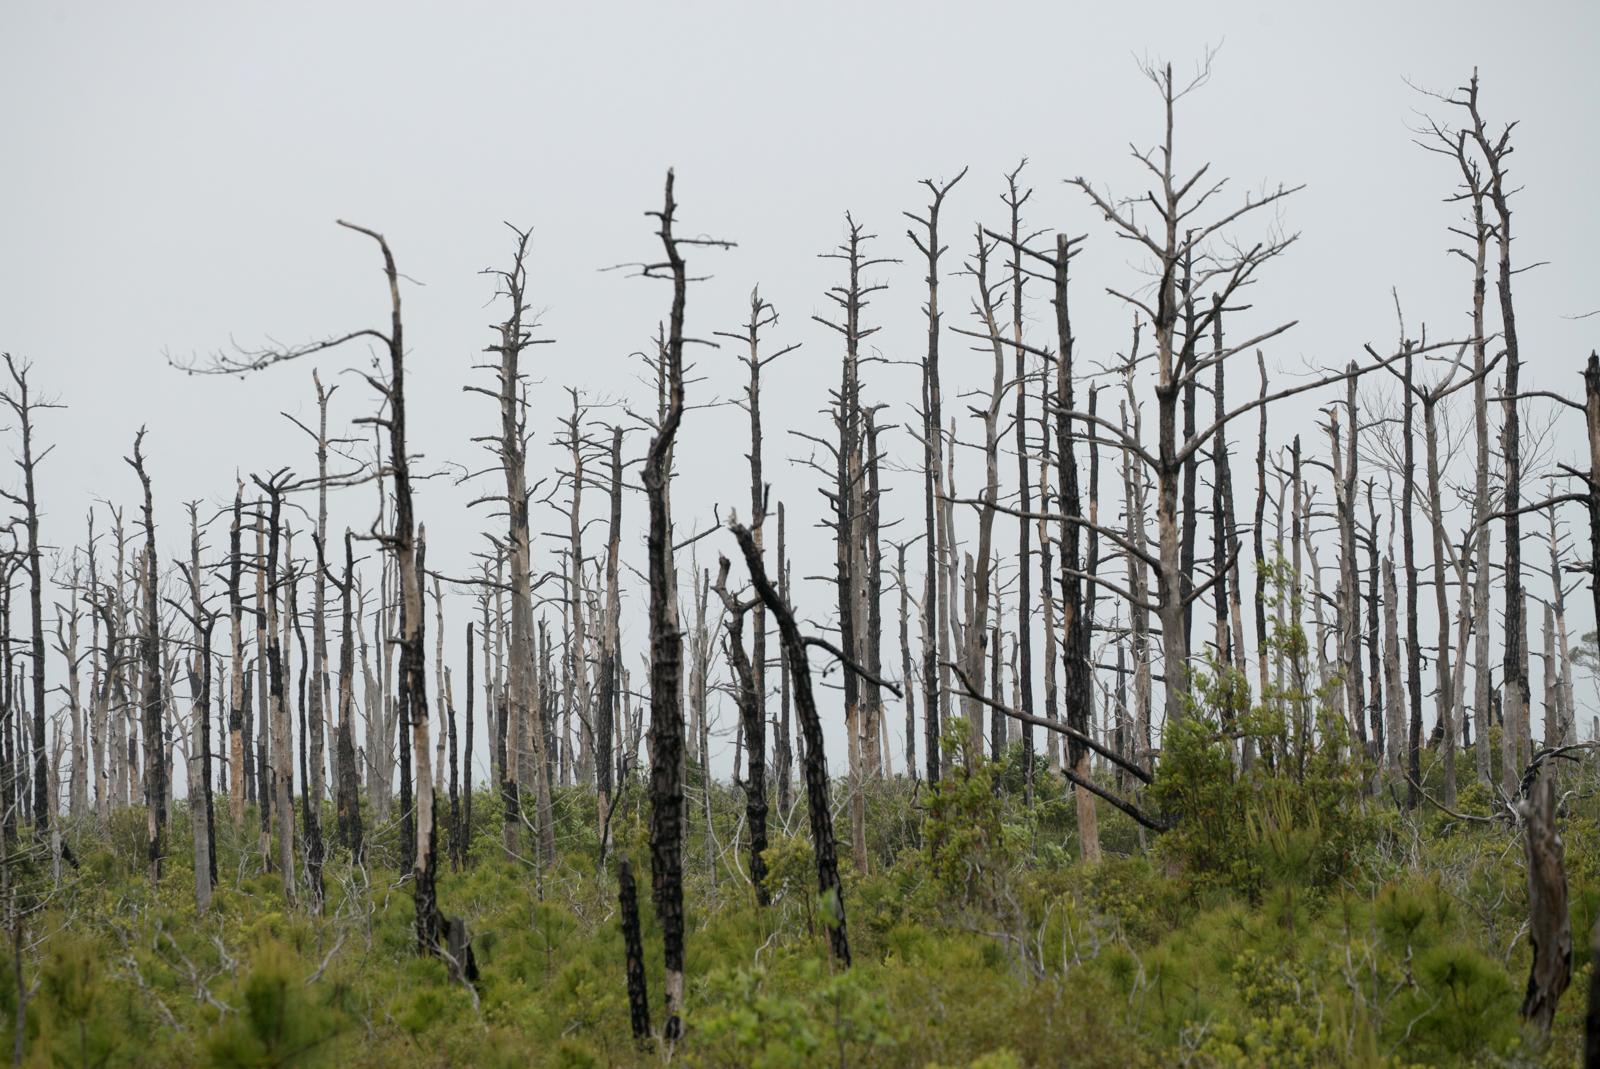 Trees killed from salt water intrusion, Alligator River National Wildlife Refuge, North Carolina